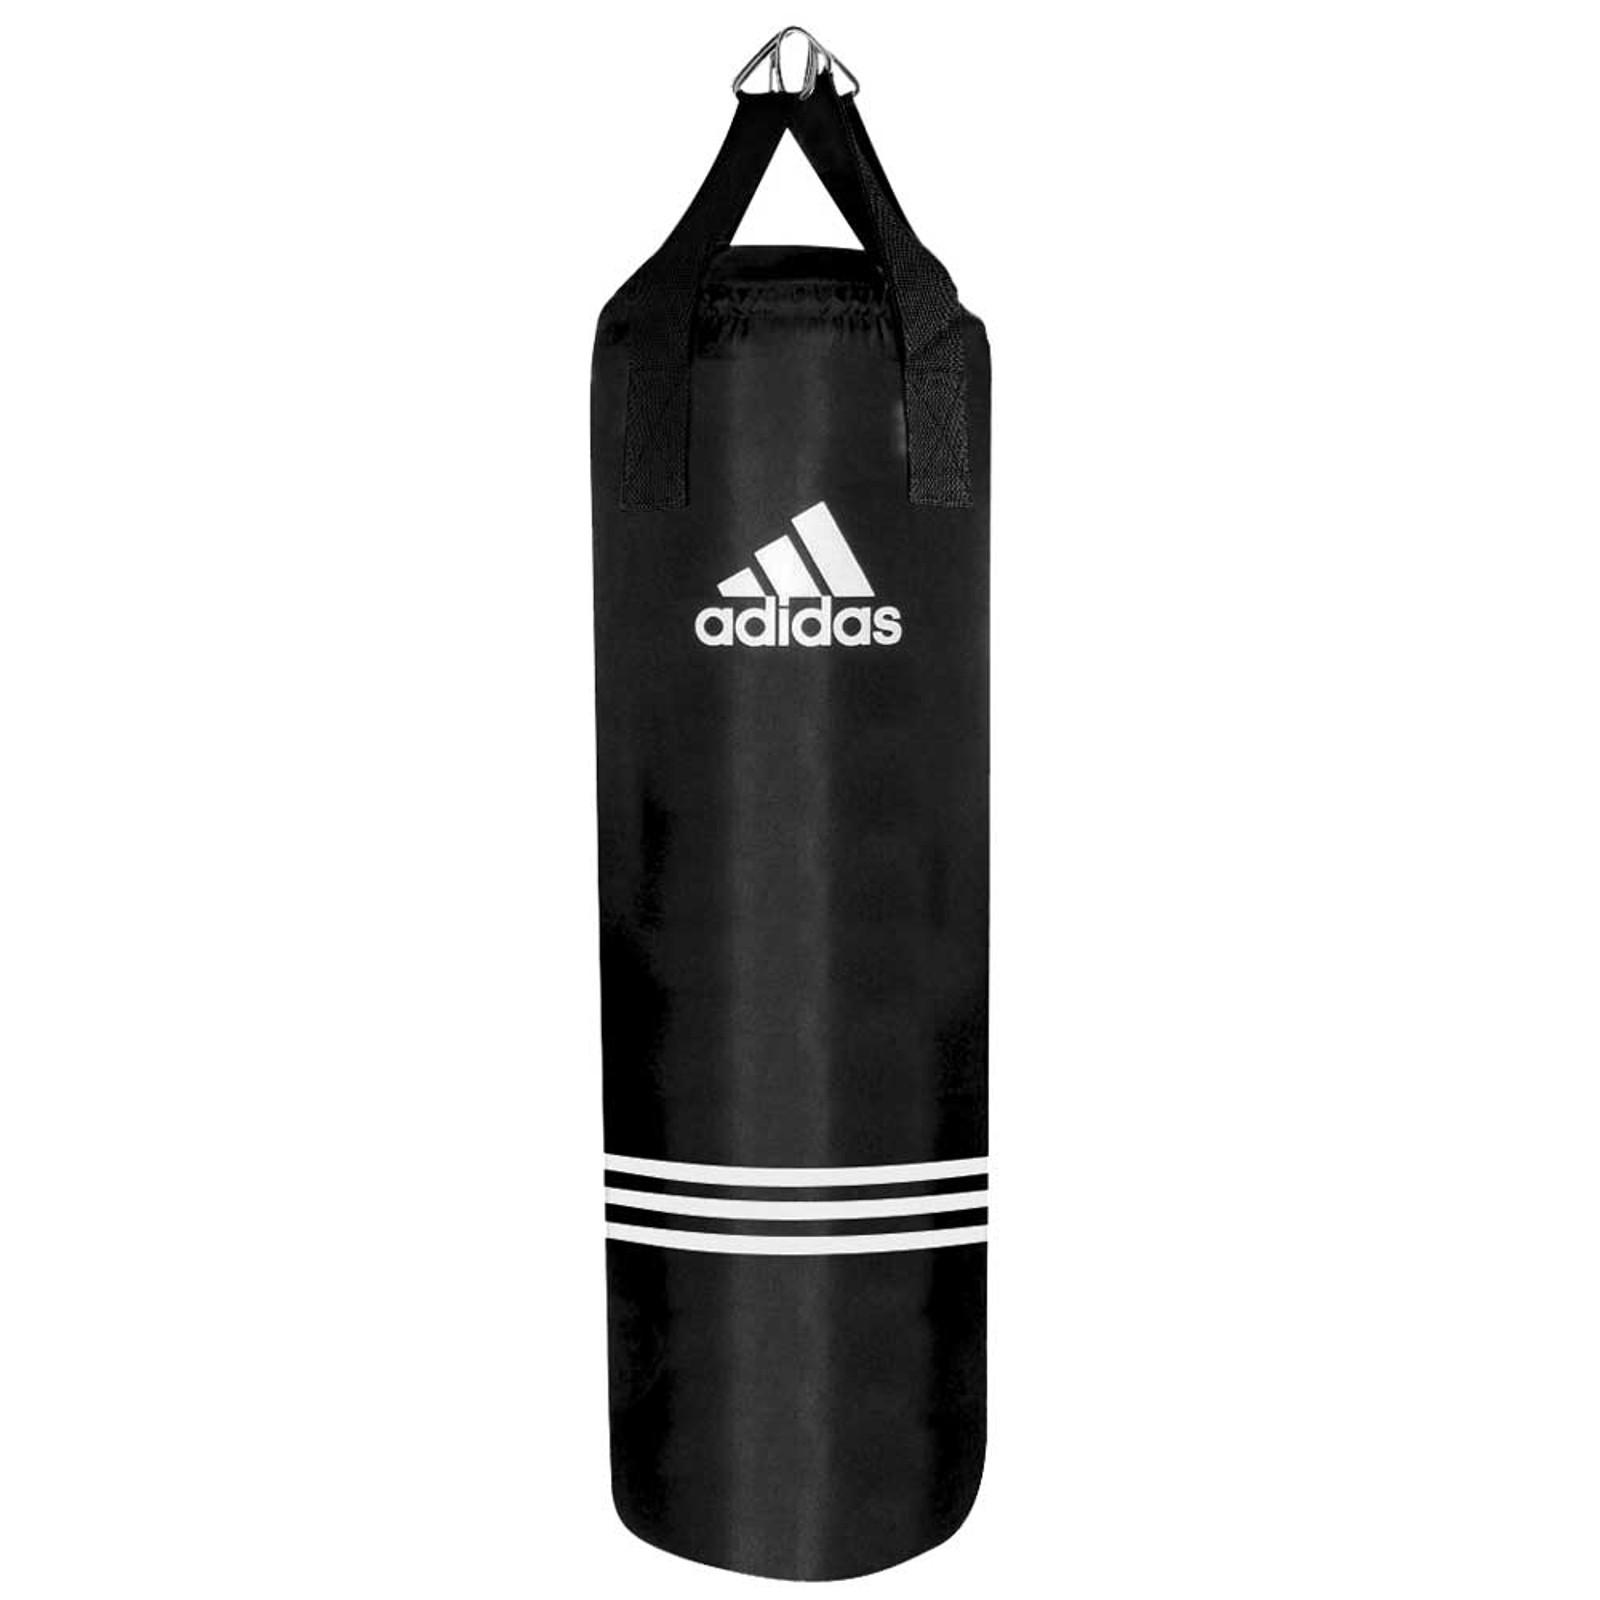 362c781bc8d Productfoto. Loading zoom. adidas. Adidas Lightweight Bokszak 90 cm | 20 kg